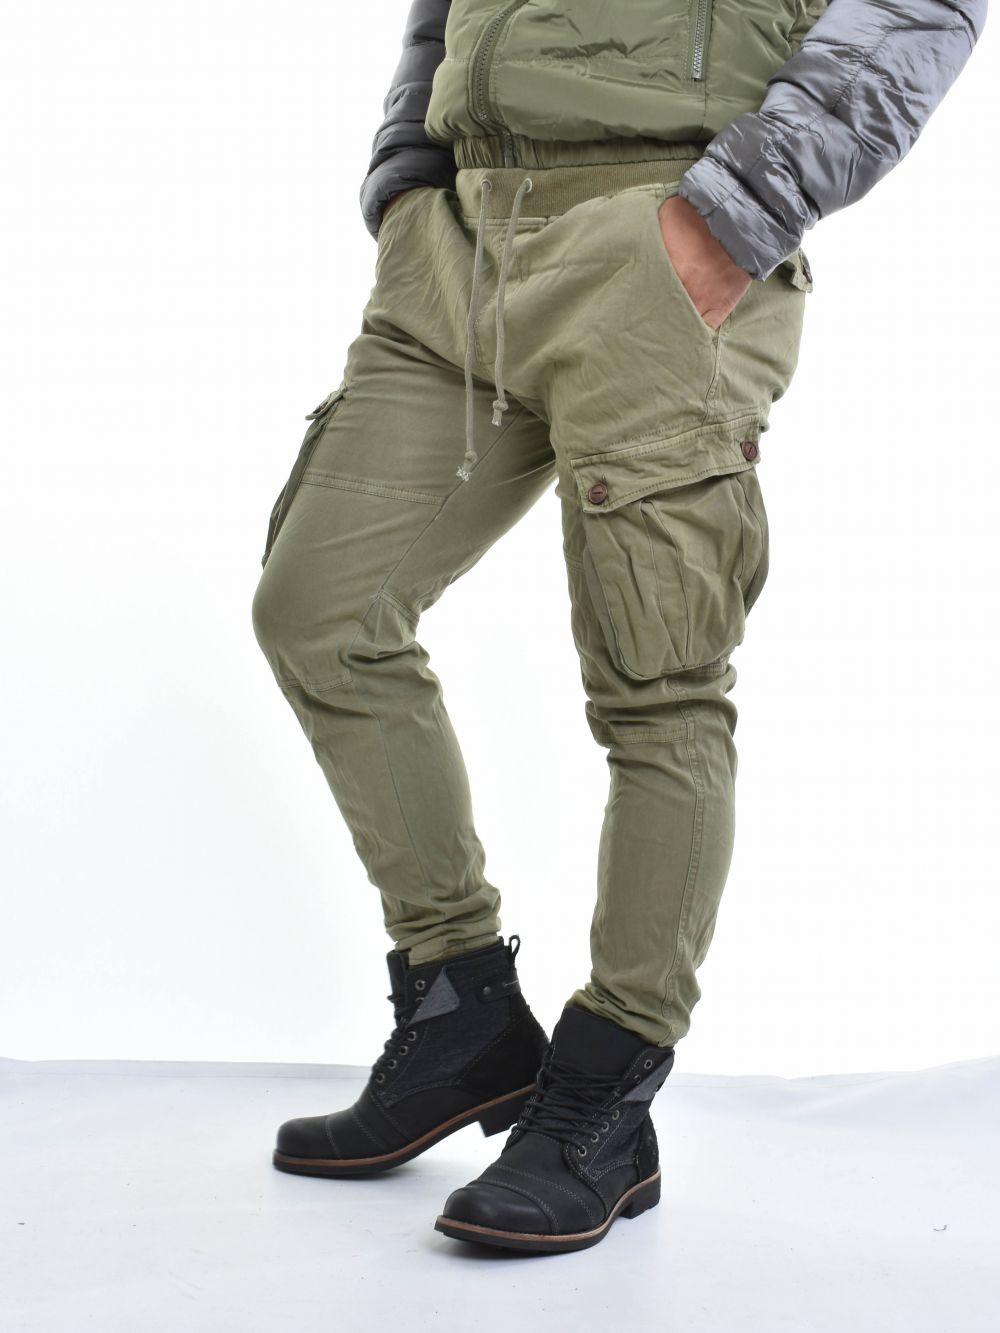 Devergo férfi nadrág | Markasbolt.hu Hivatalos DEVERGO